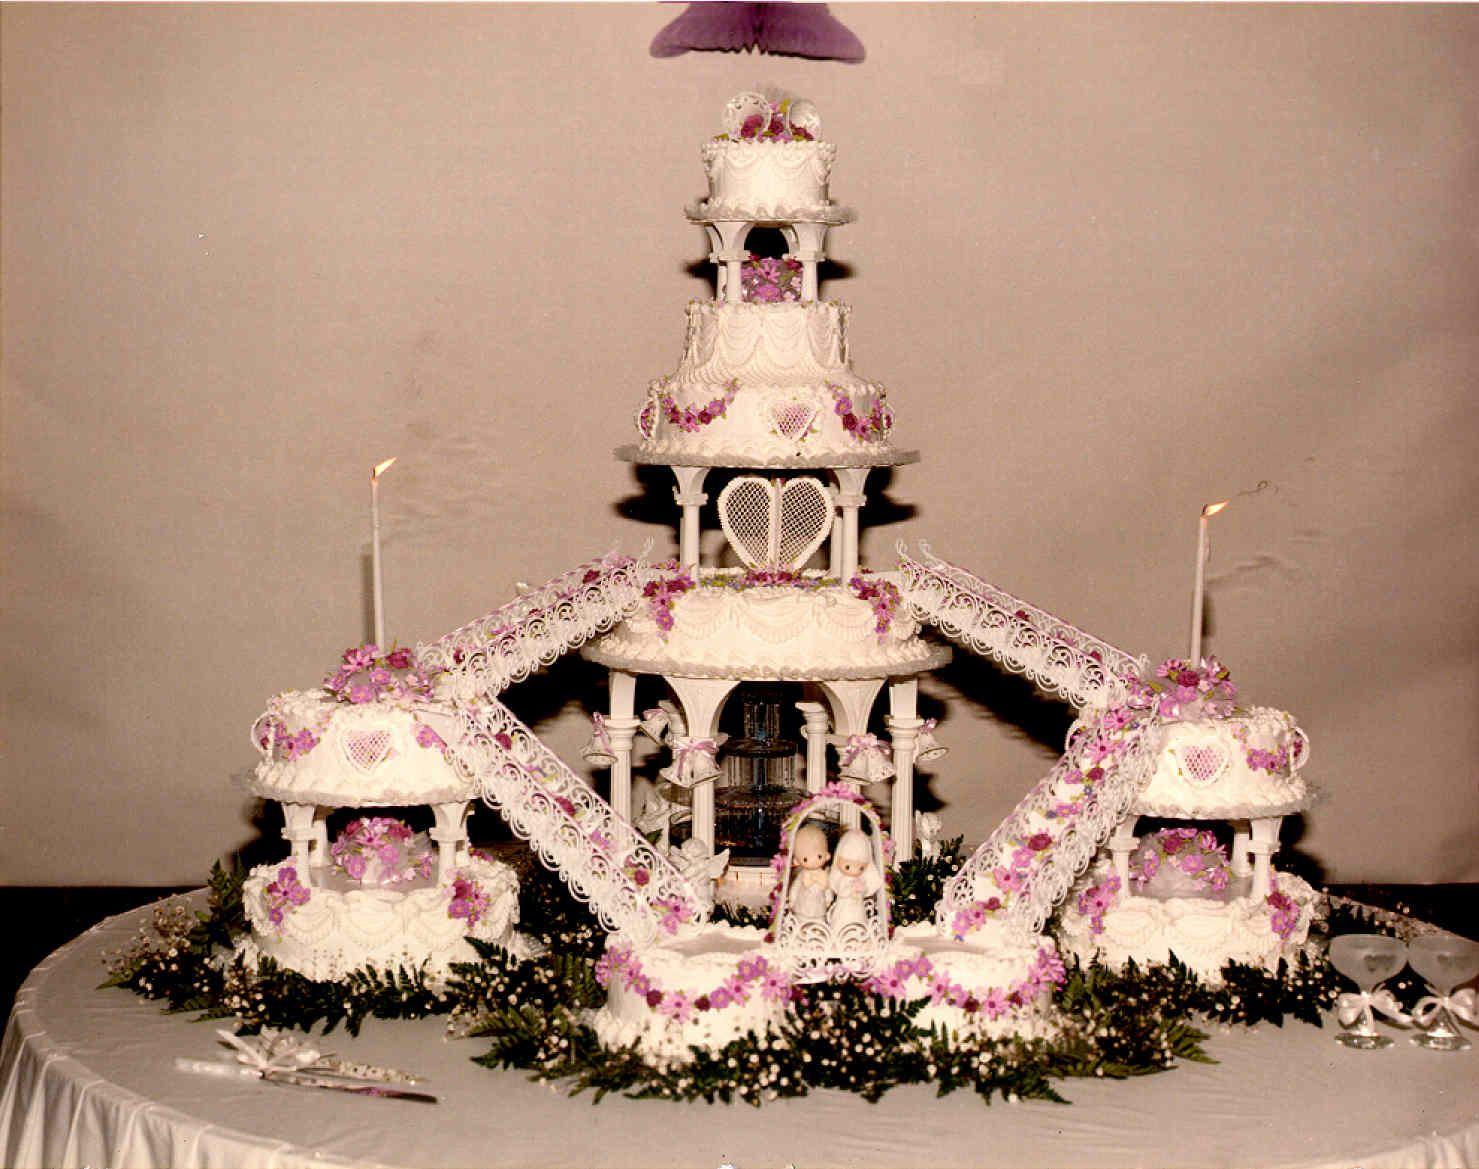 Big Wedding Cakes cake 9 a big wedding cake that took